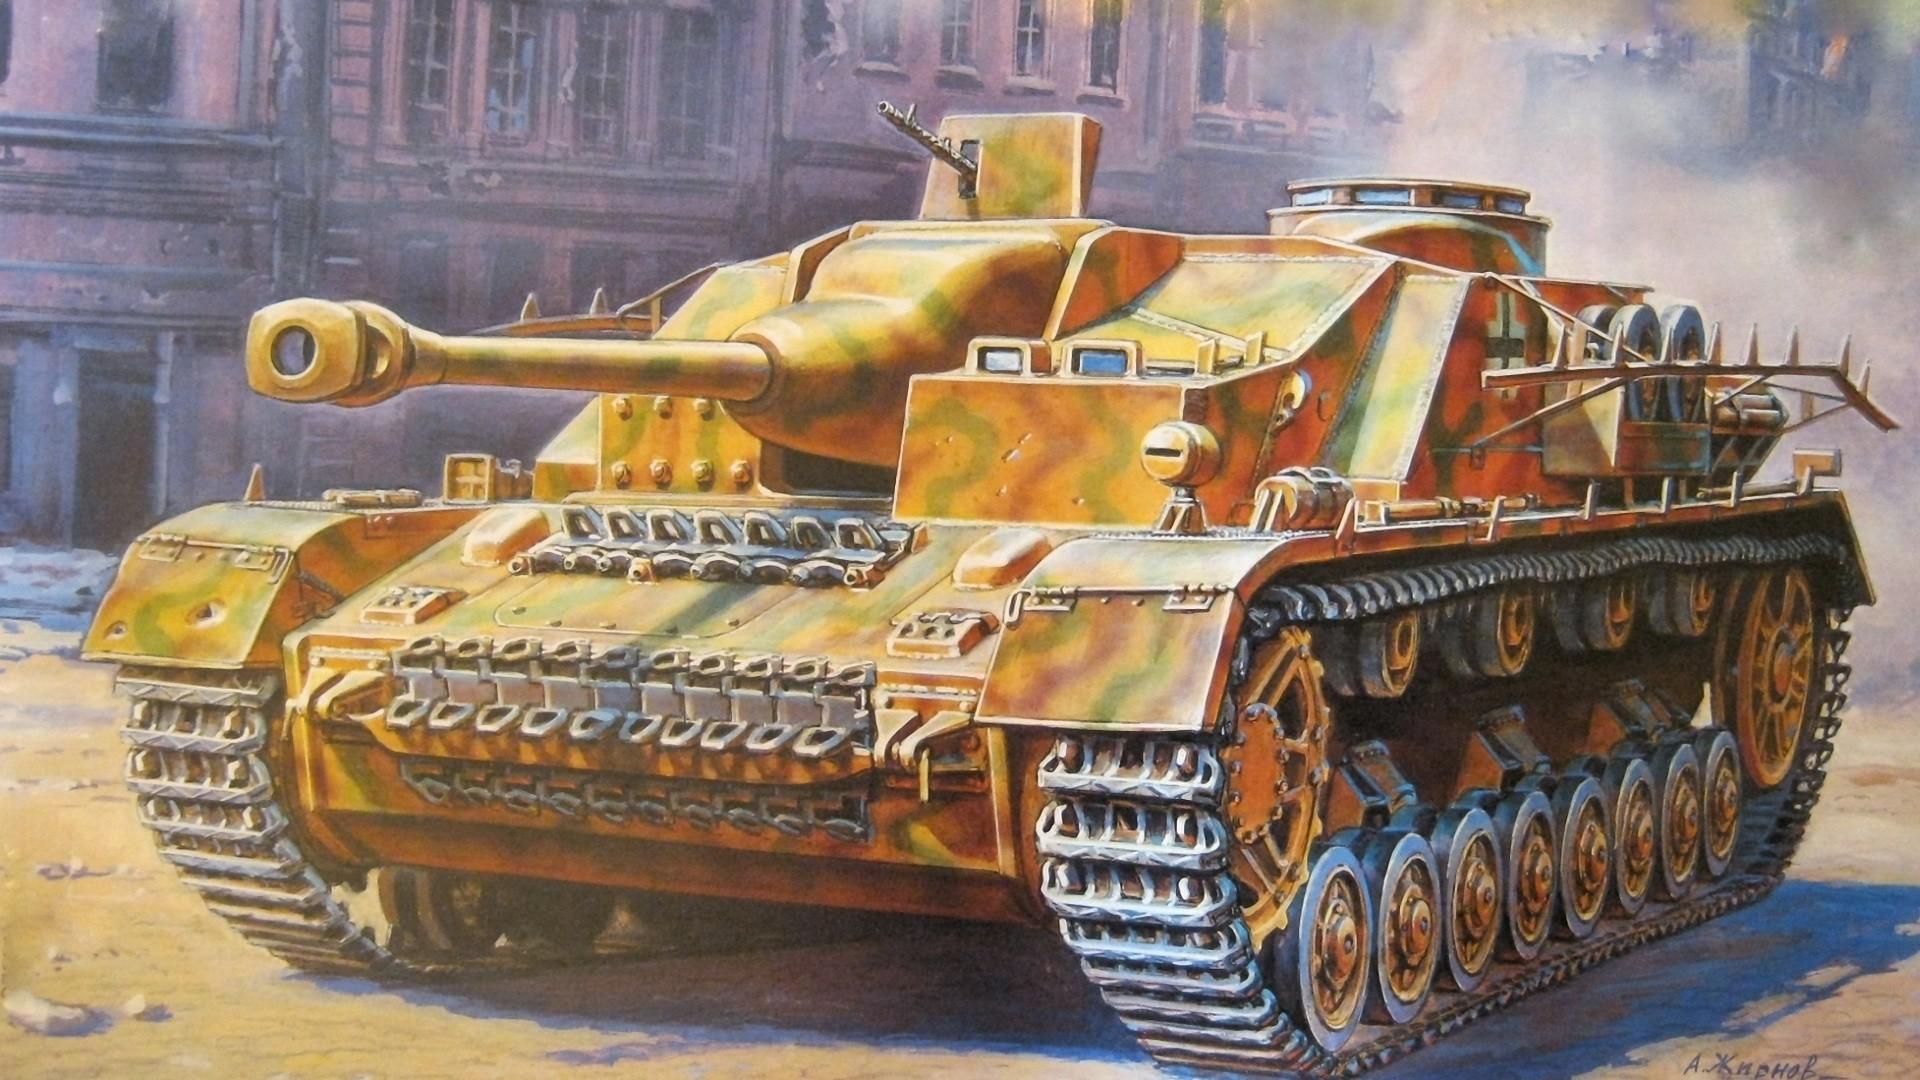 4k Girls Und Panzer Wallpaper Army Tank Wallpaper Hd 63 Images